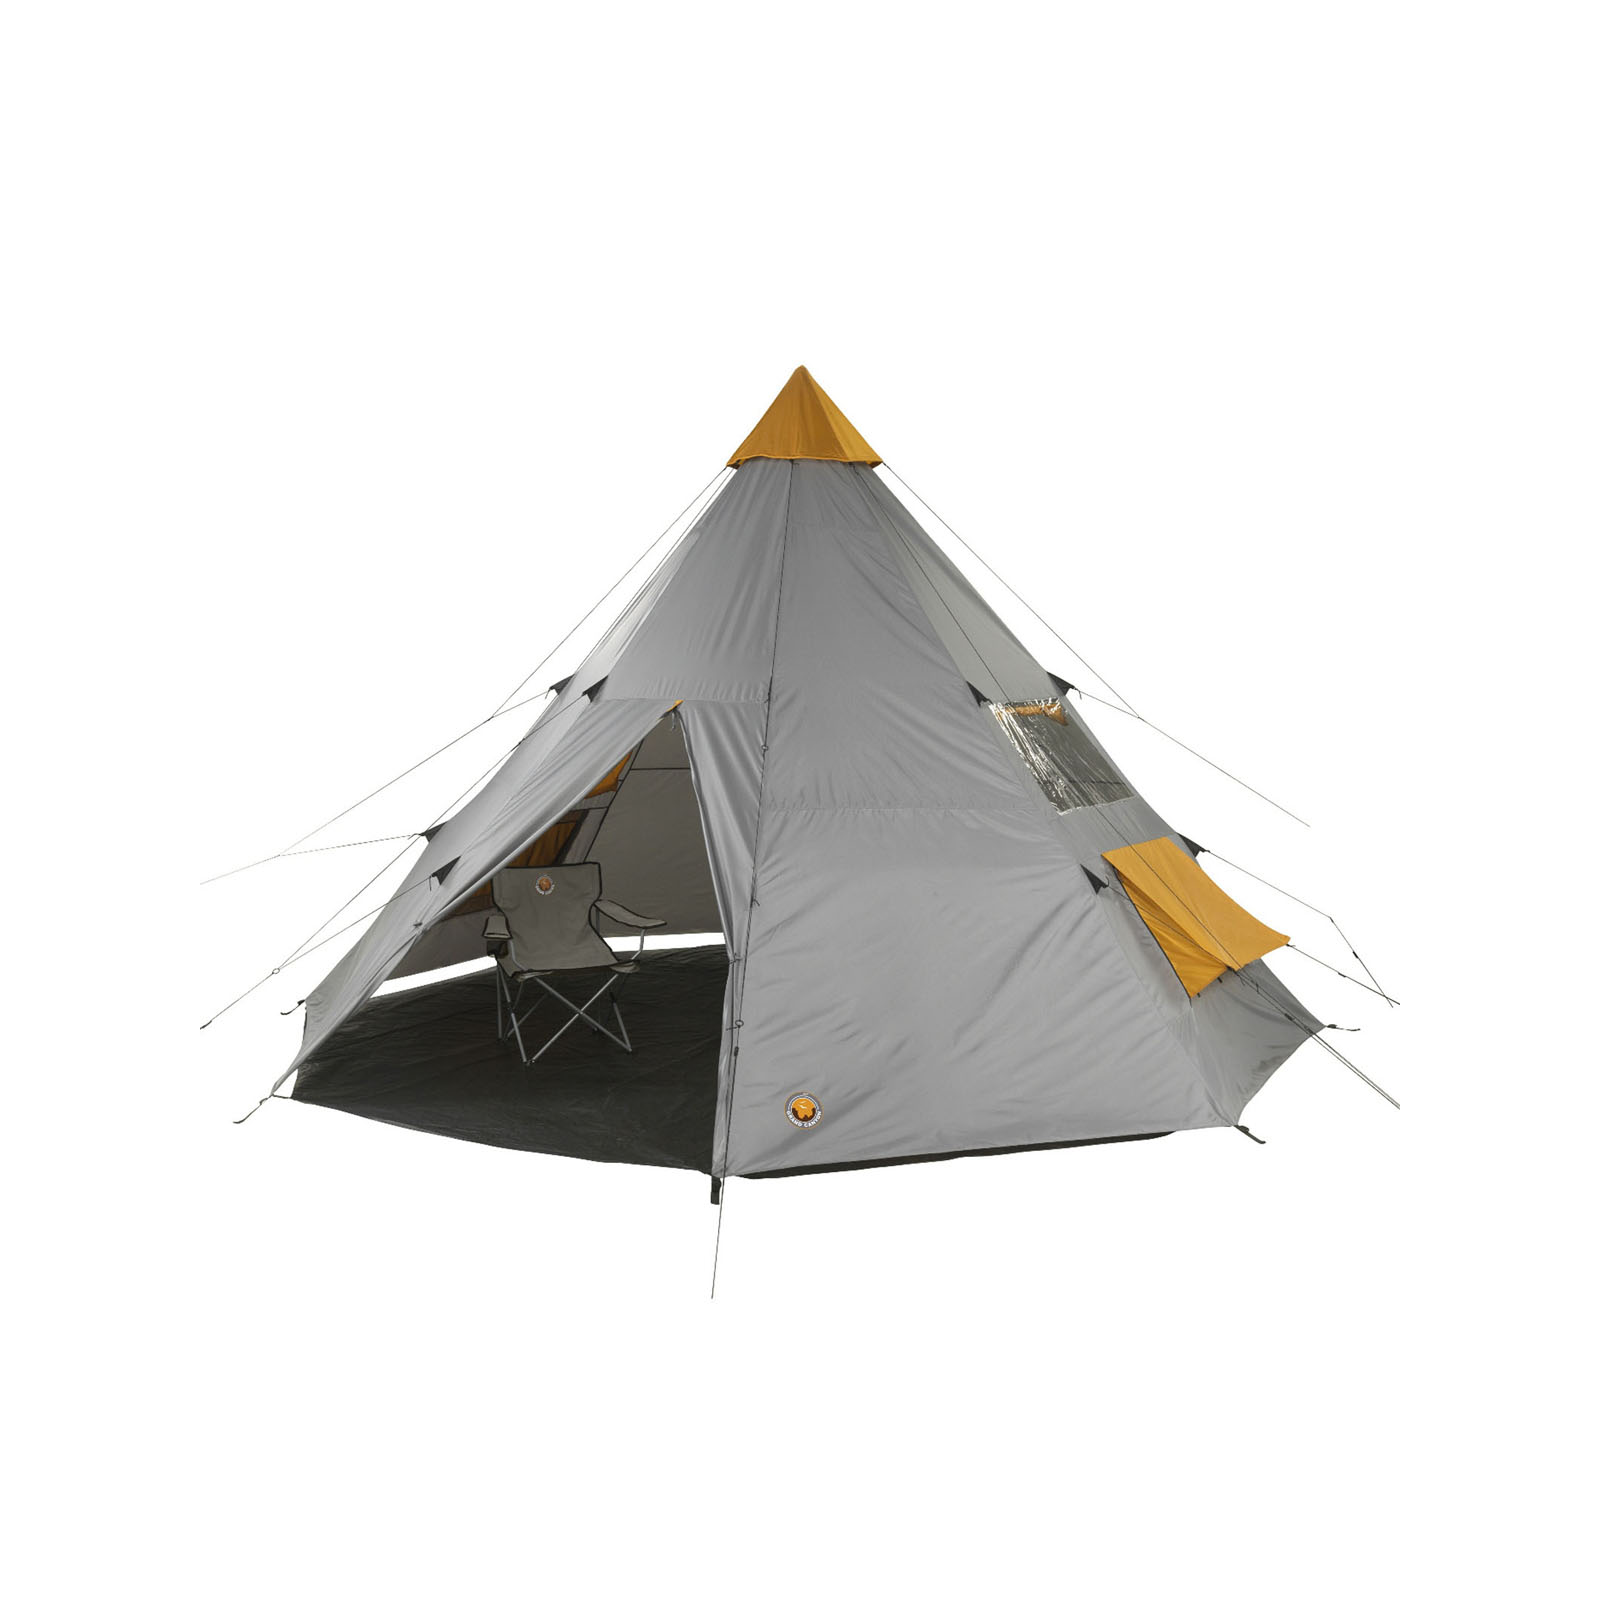 Camping Zelt 8 Mann : Tipi zelt grand canyon tepee mann gruppenzelt camping